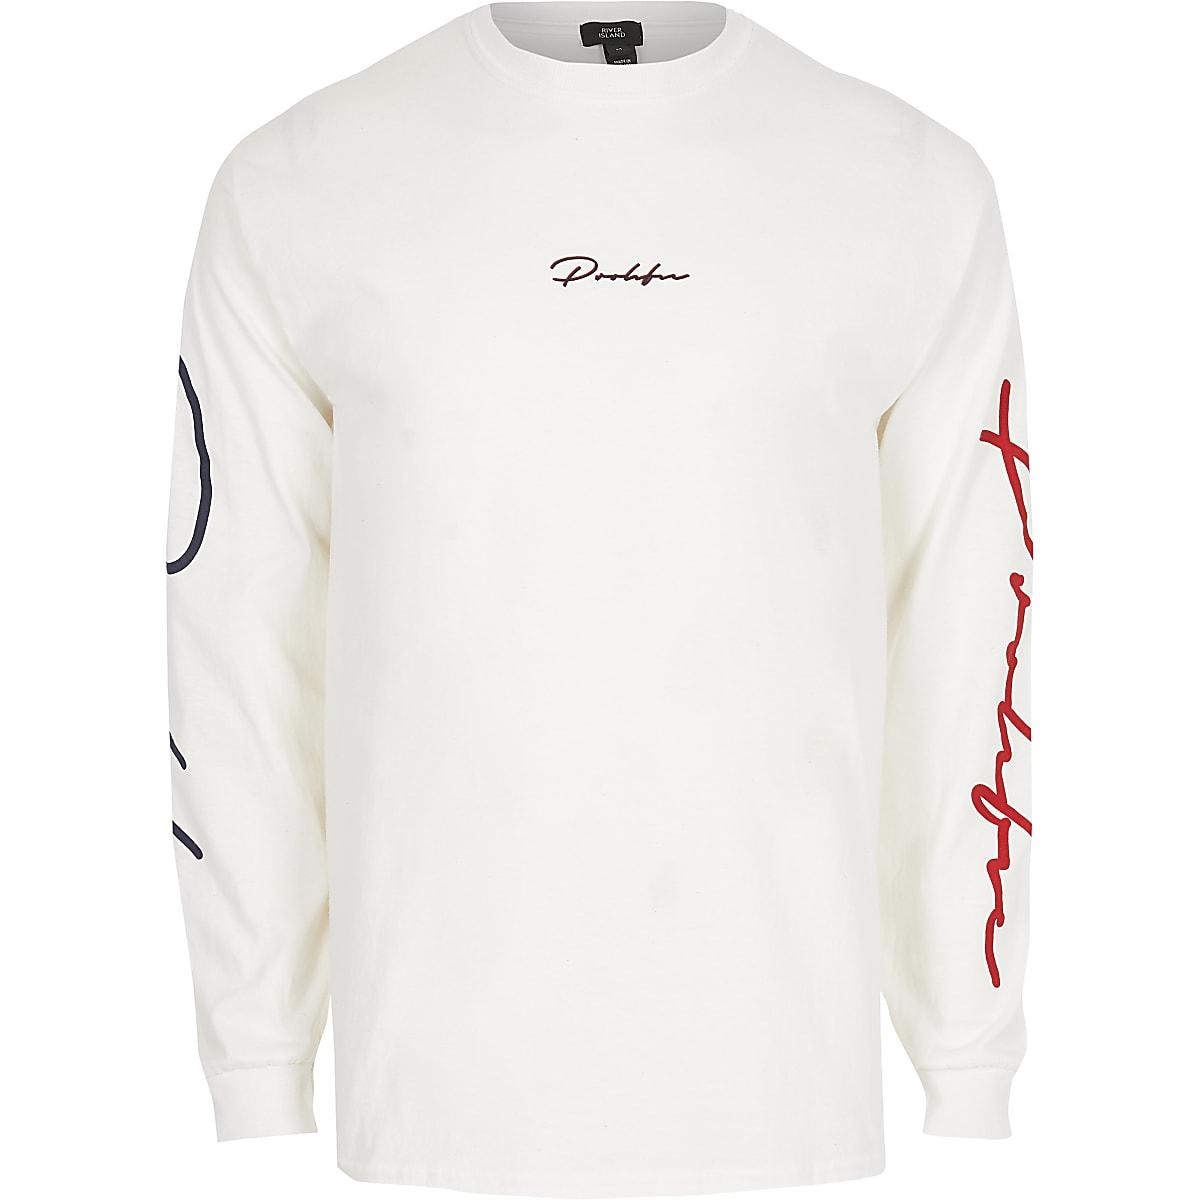 White 'Prolific' long sleeve print T-shirt